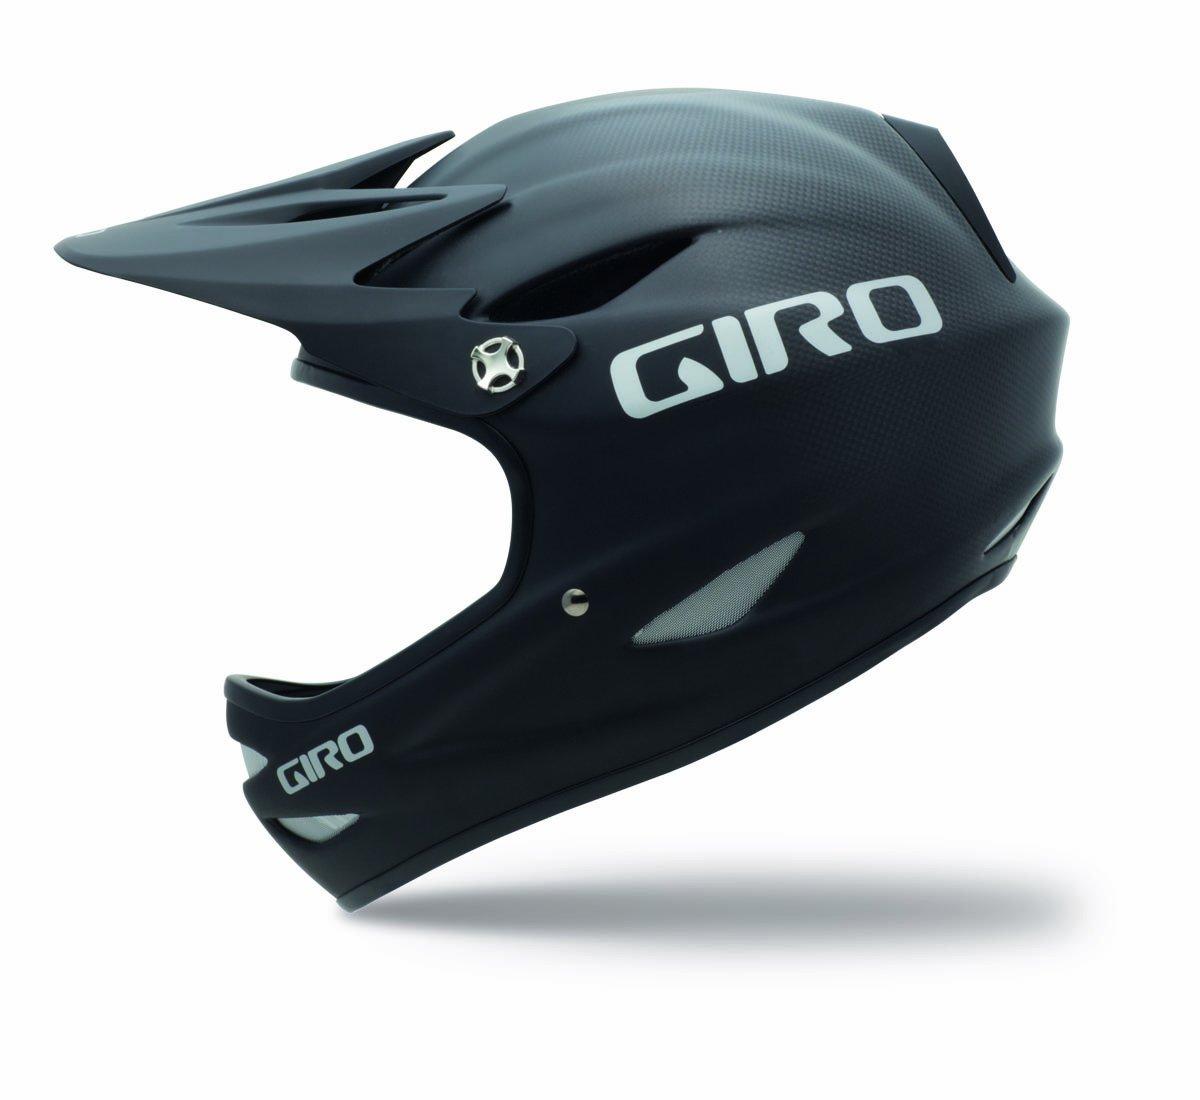 Giro Remedy CF DH Fahrrad Helm carbon schwarz 2013